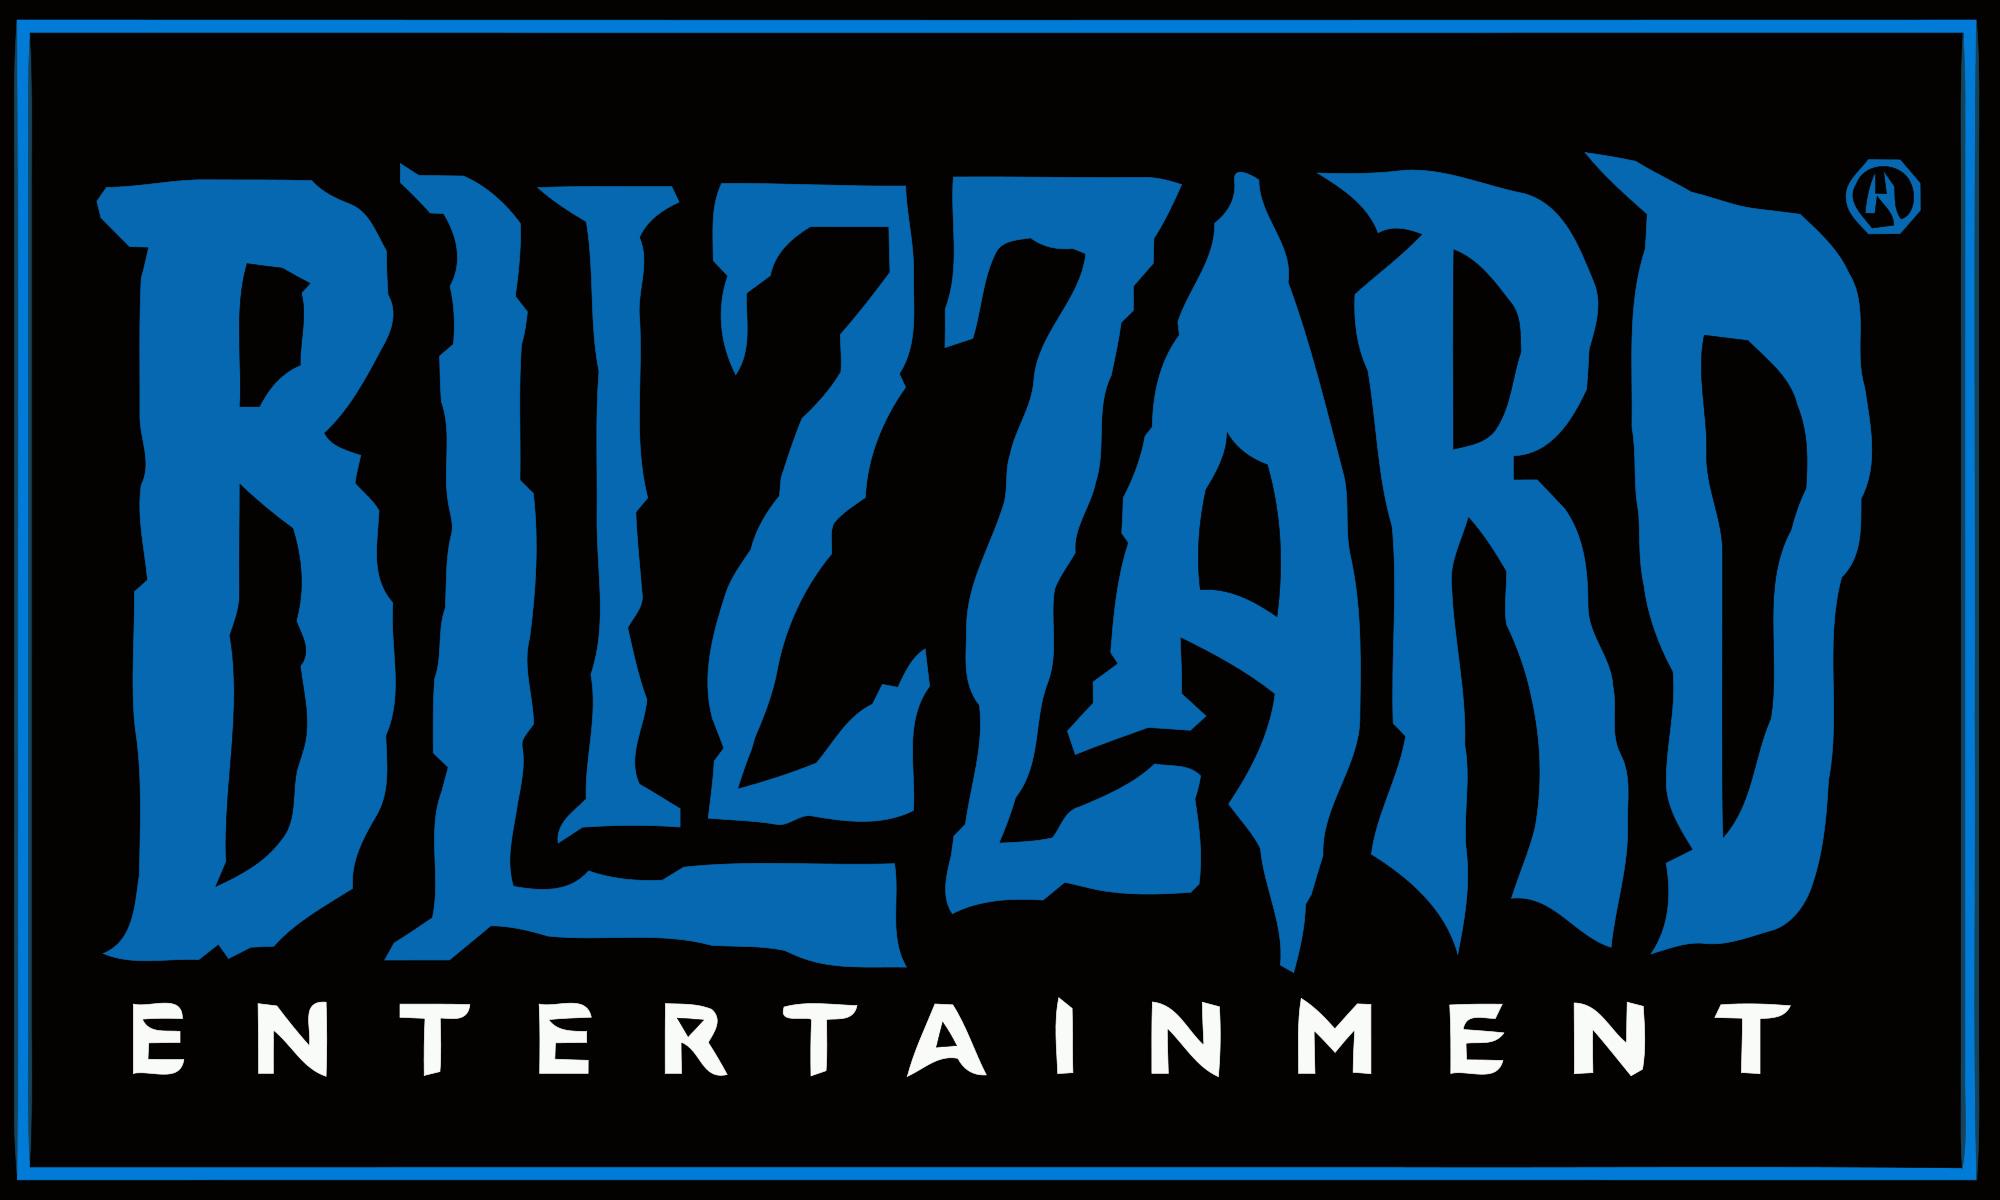 blizzard-entertainment-logo